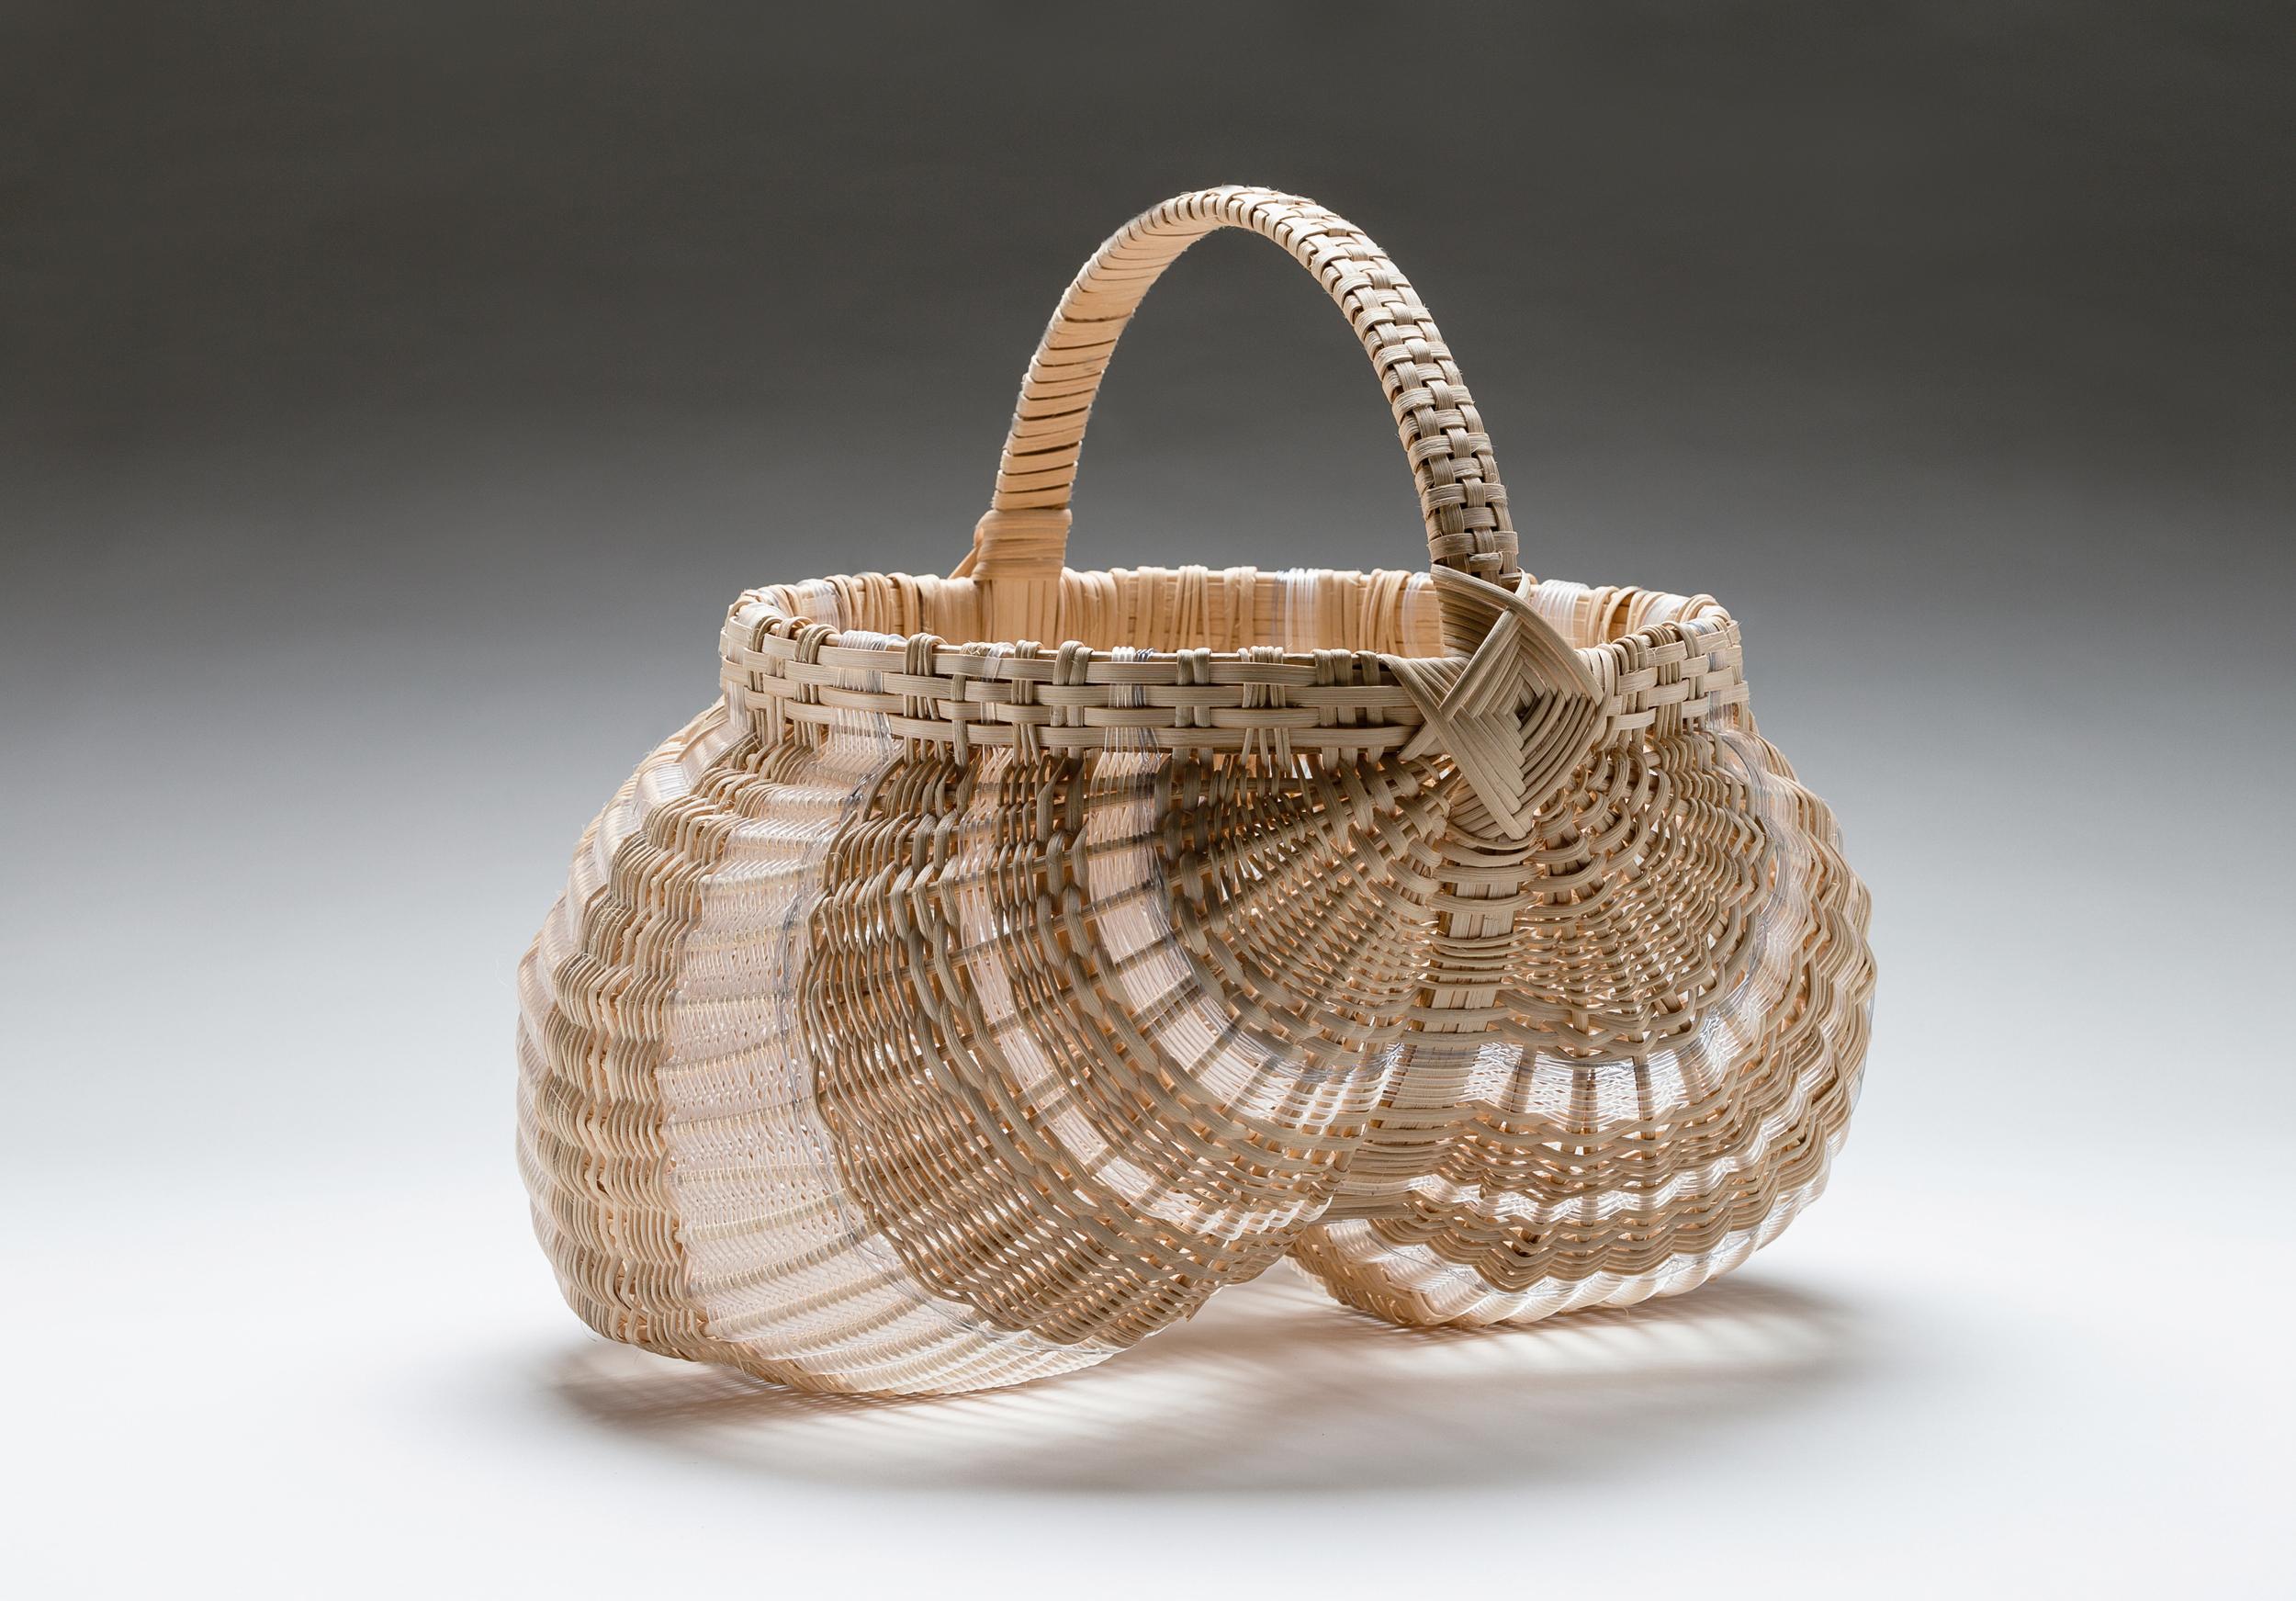 rib-suji-basket300ppi - Copy.jpg